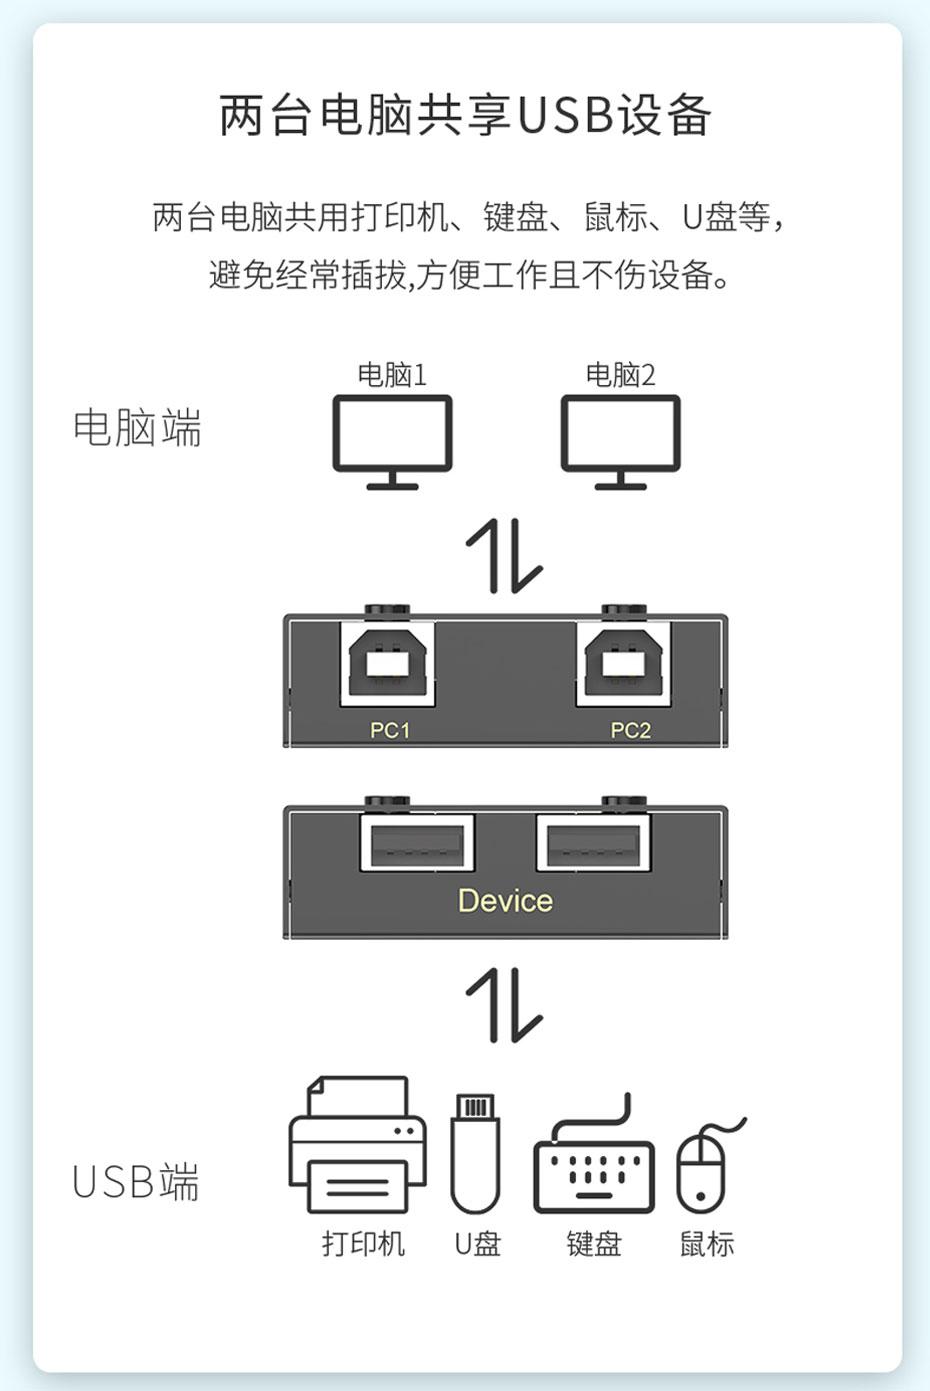 USB共享器二进二出02U共享两台电脑